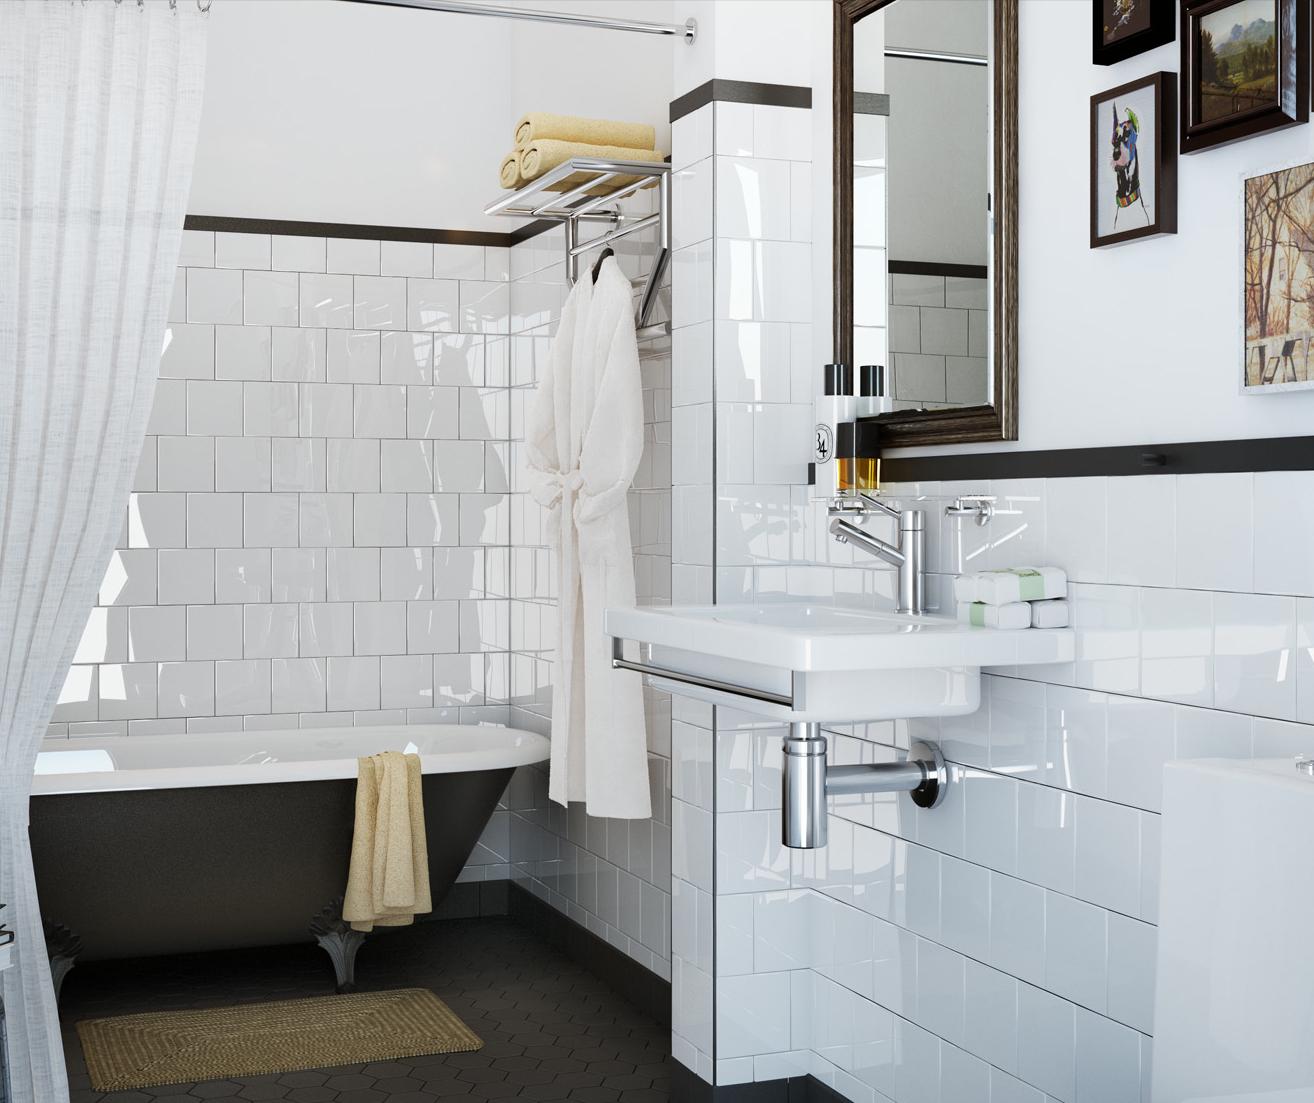 slate on slate | Интерьер, идеи для дома | Pinterest | Slate, Bath ...